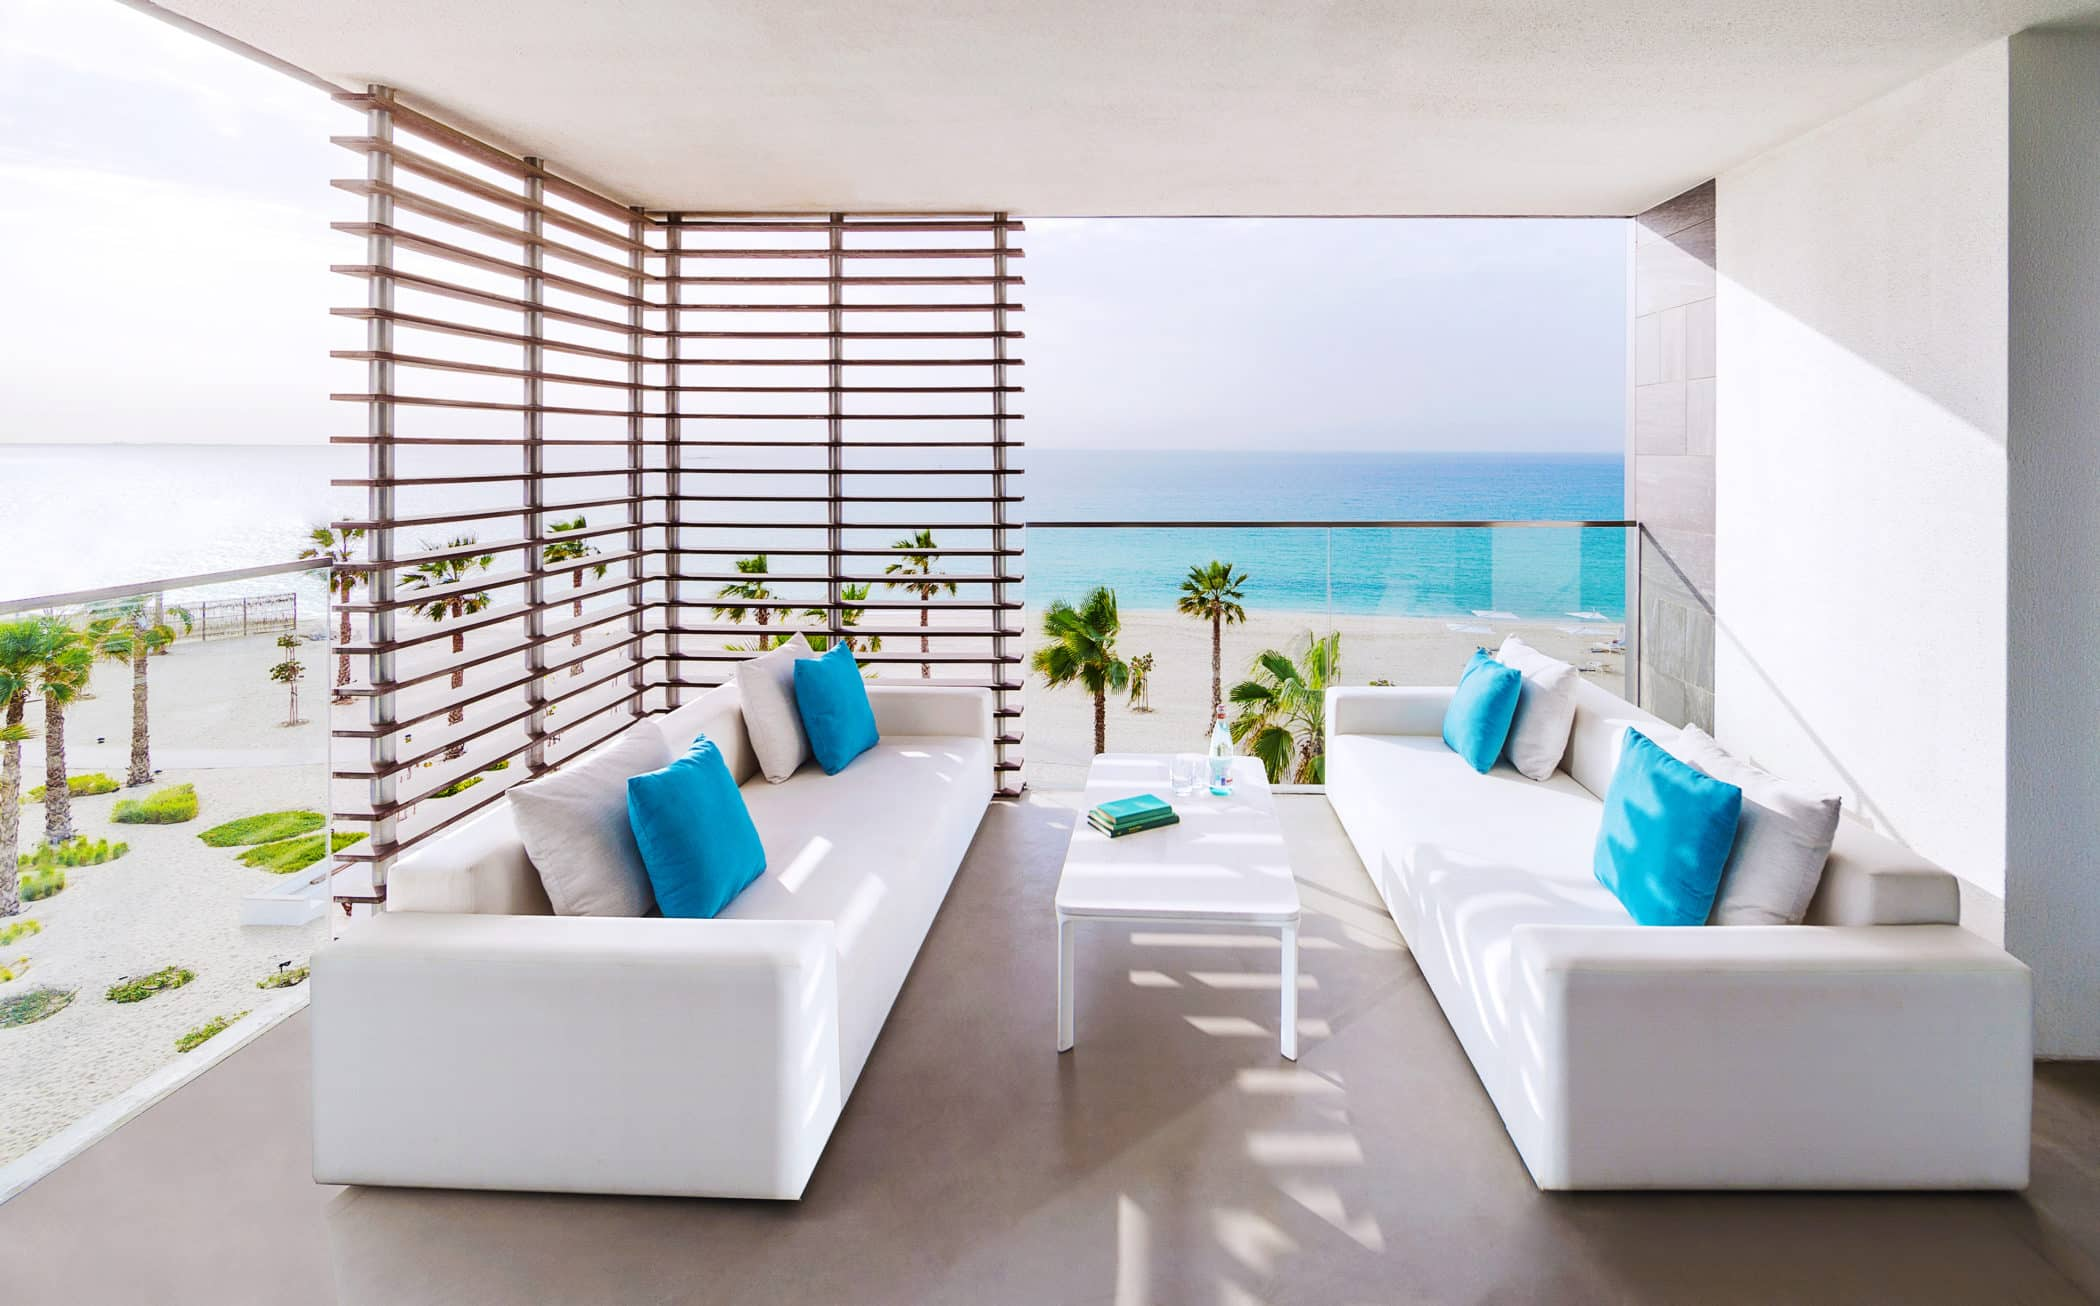 Nikki Beach by Meraas at Pearl Jumeirah. Luxury apartments for Sale in Dubai